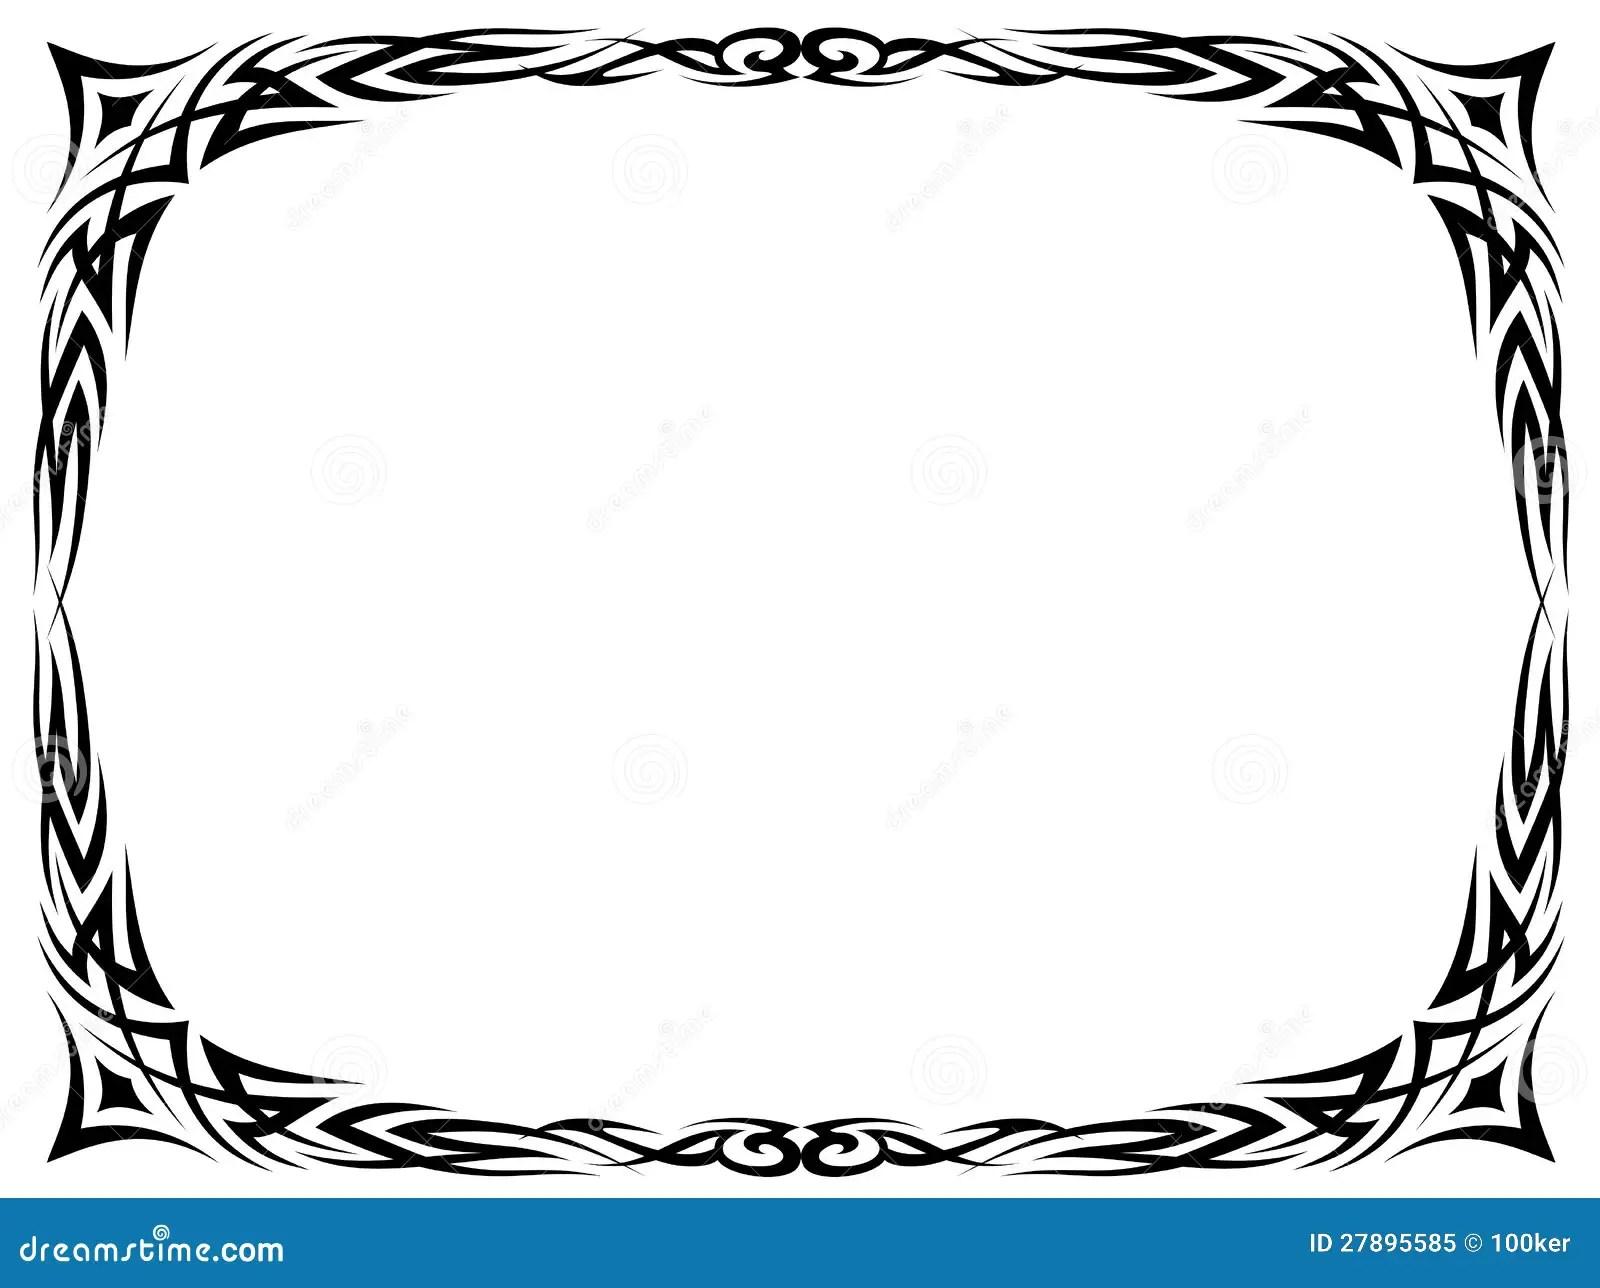 Simple Black Tattoo Ornamental Decorative Frame Royalty